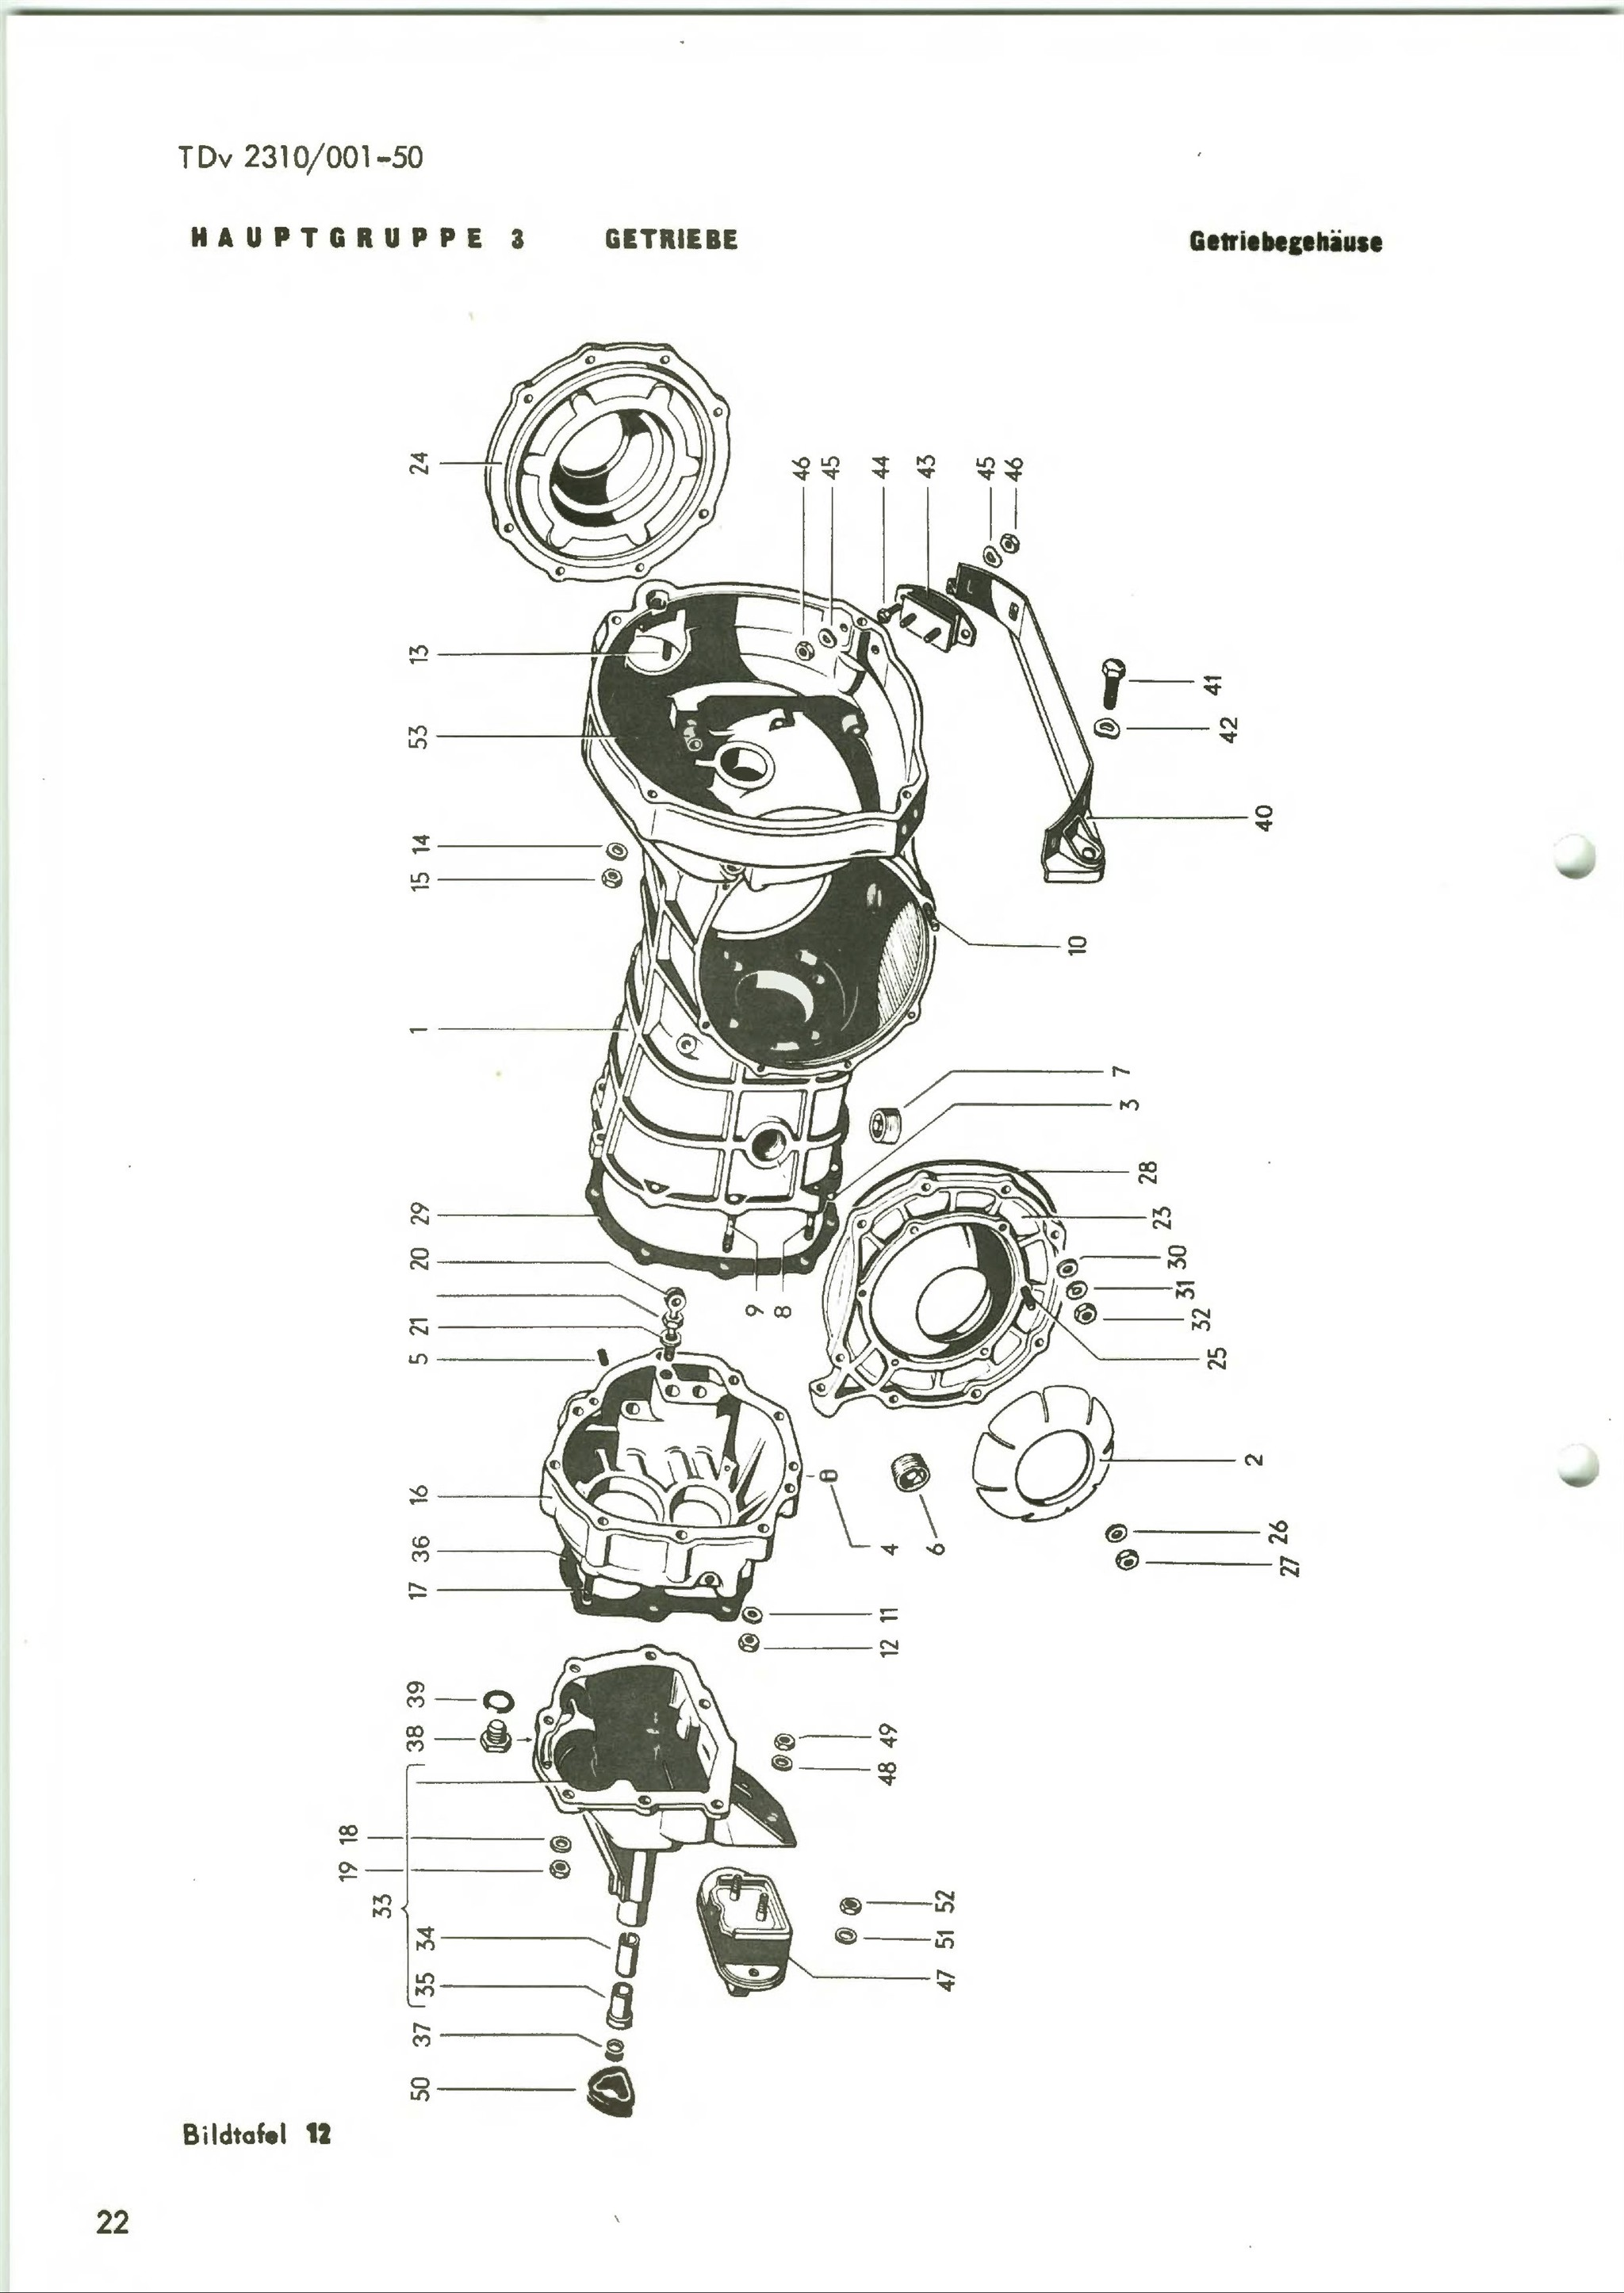 Vintage Vw Beetle Parts